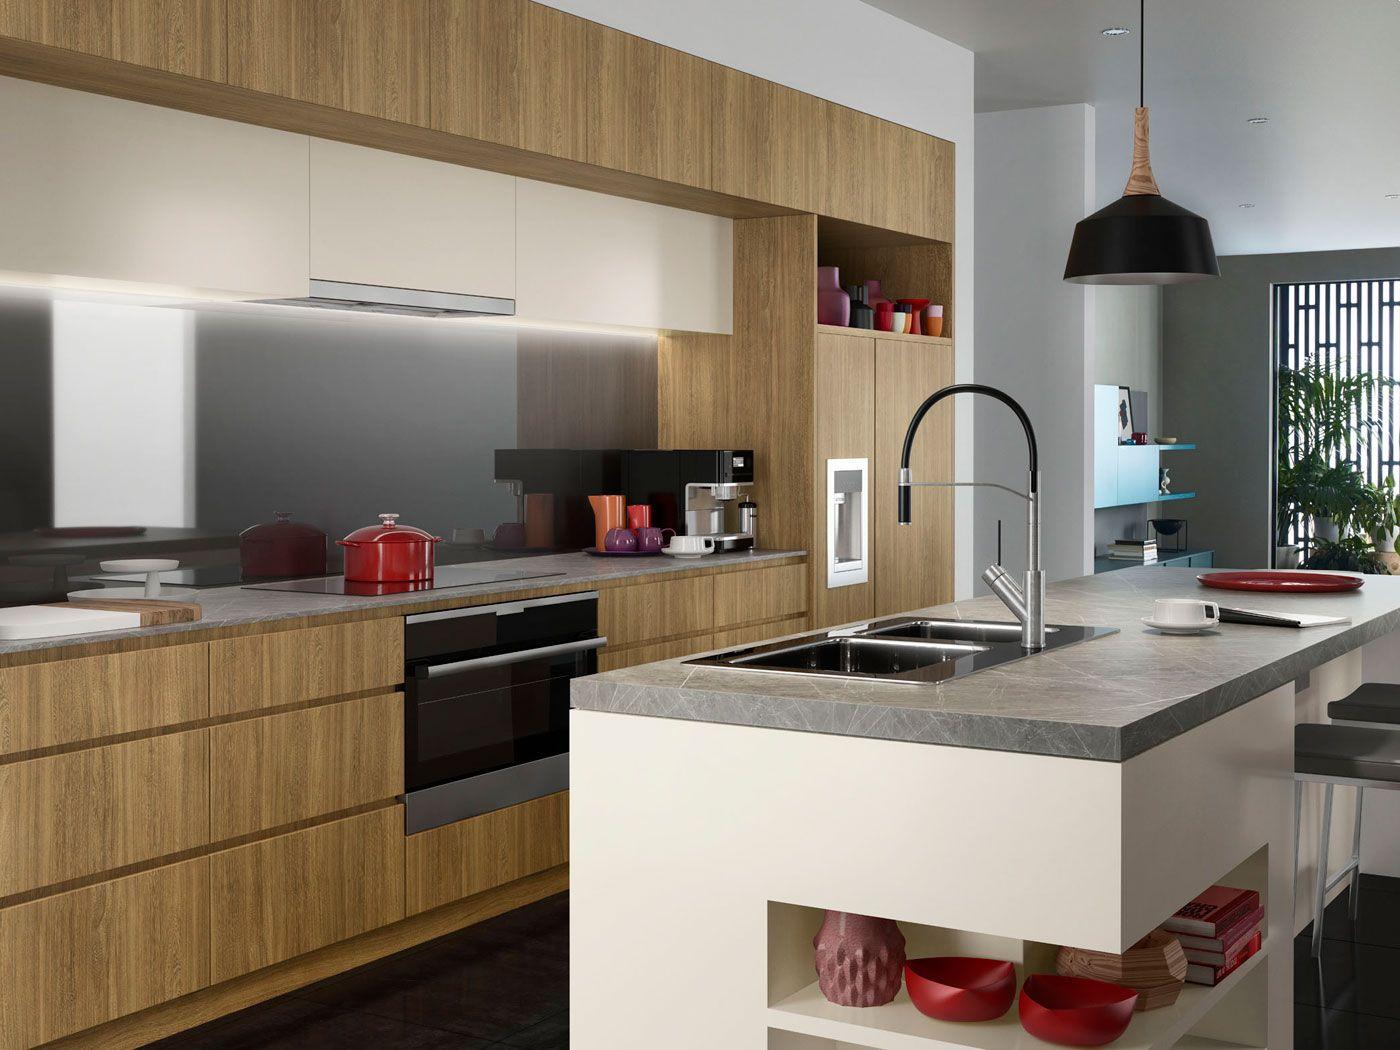 LNX173_Kitchen-colour-palette-update_1400.jpg 1,400×1,050 pixels ...